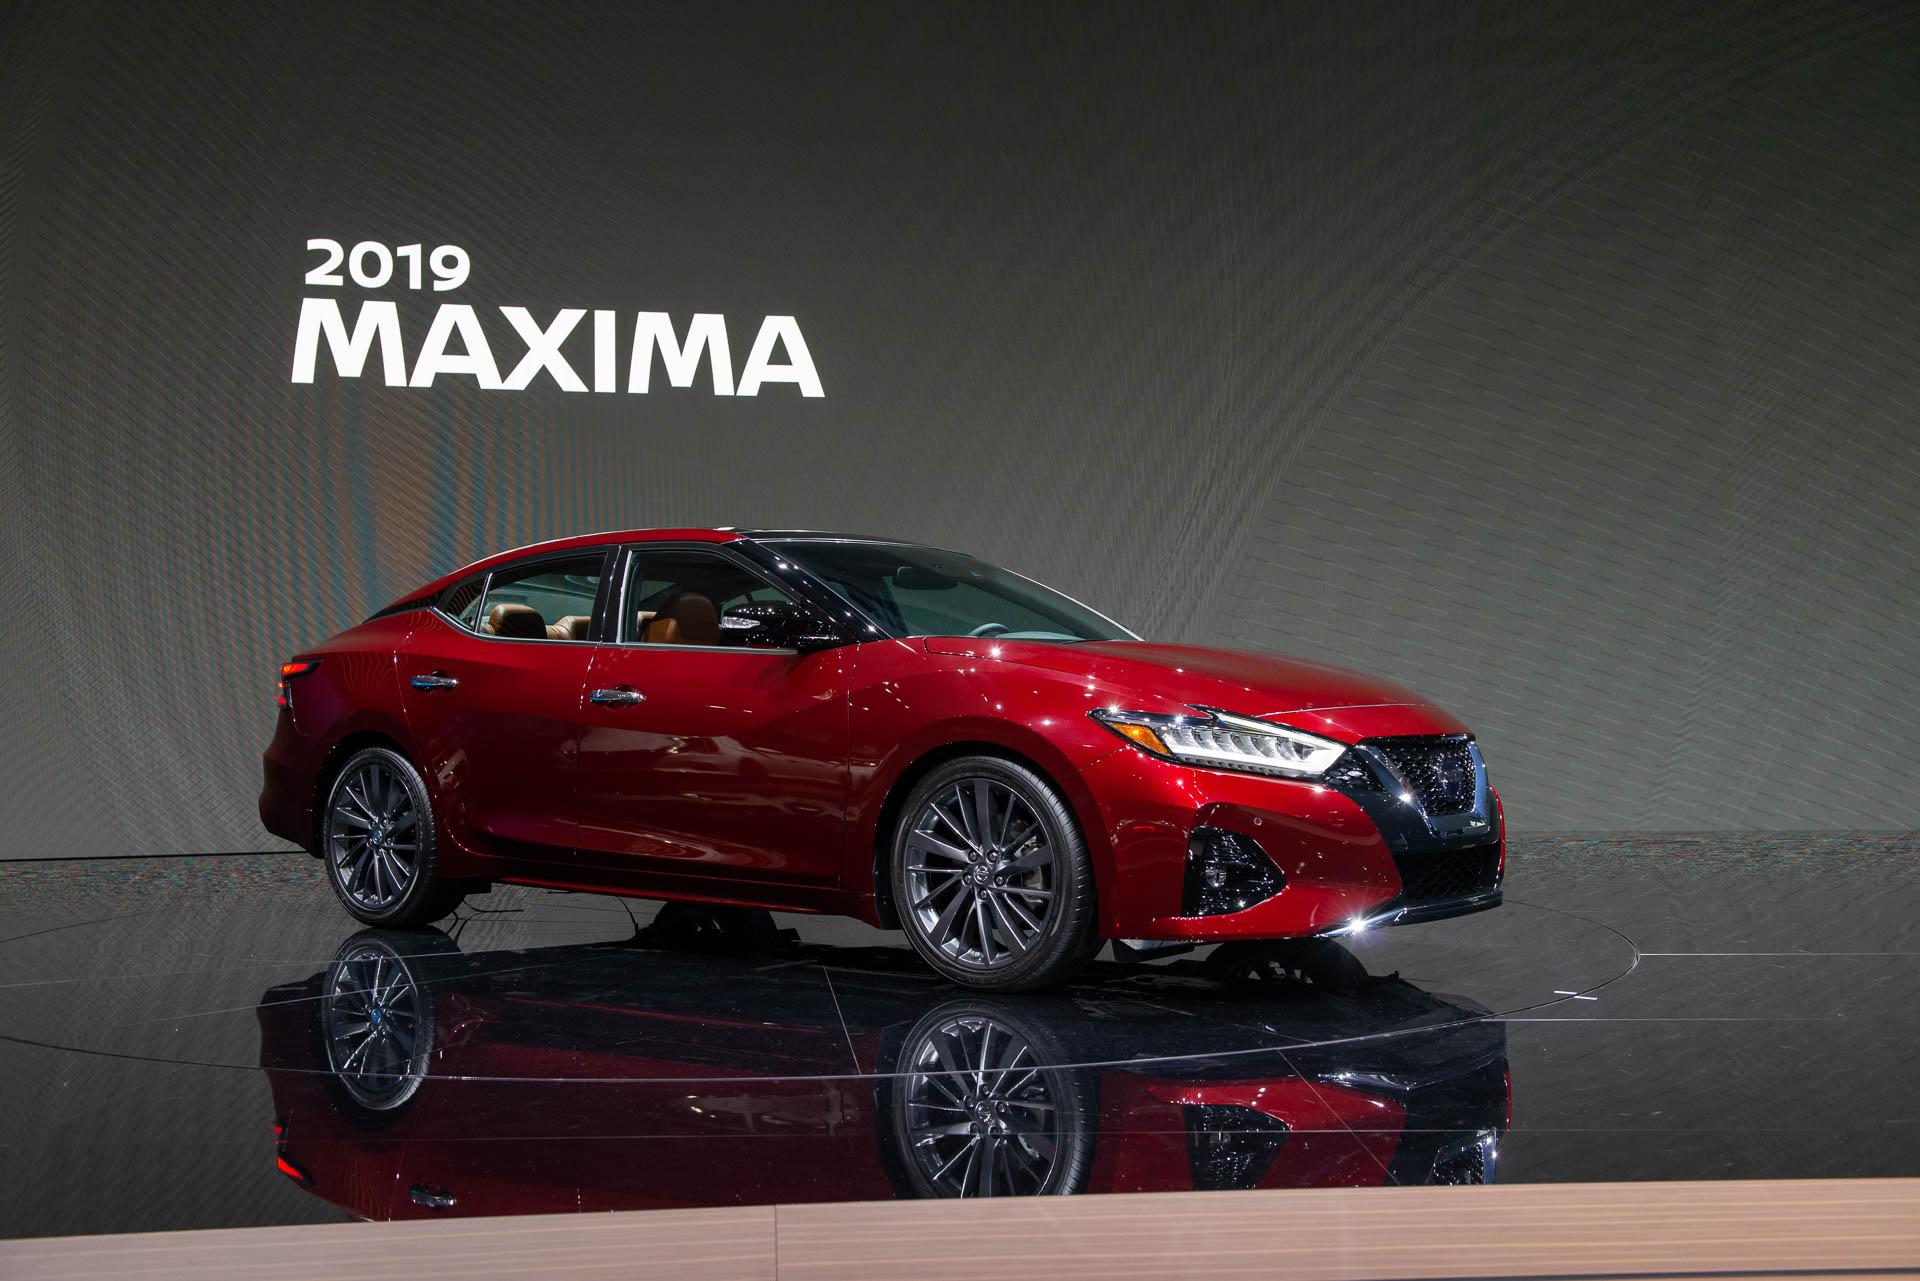 New Nissan Maxima >> 2019 Nissan Maxima Sedan Sports New Look More Safety Tech